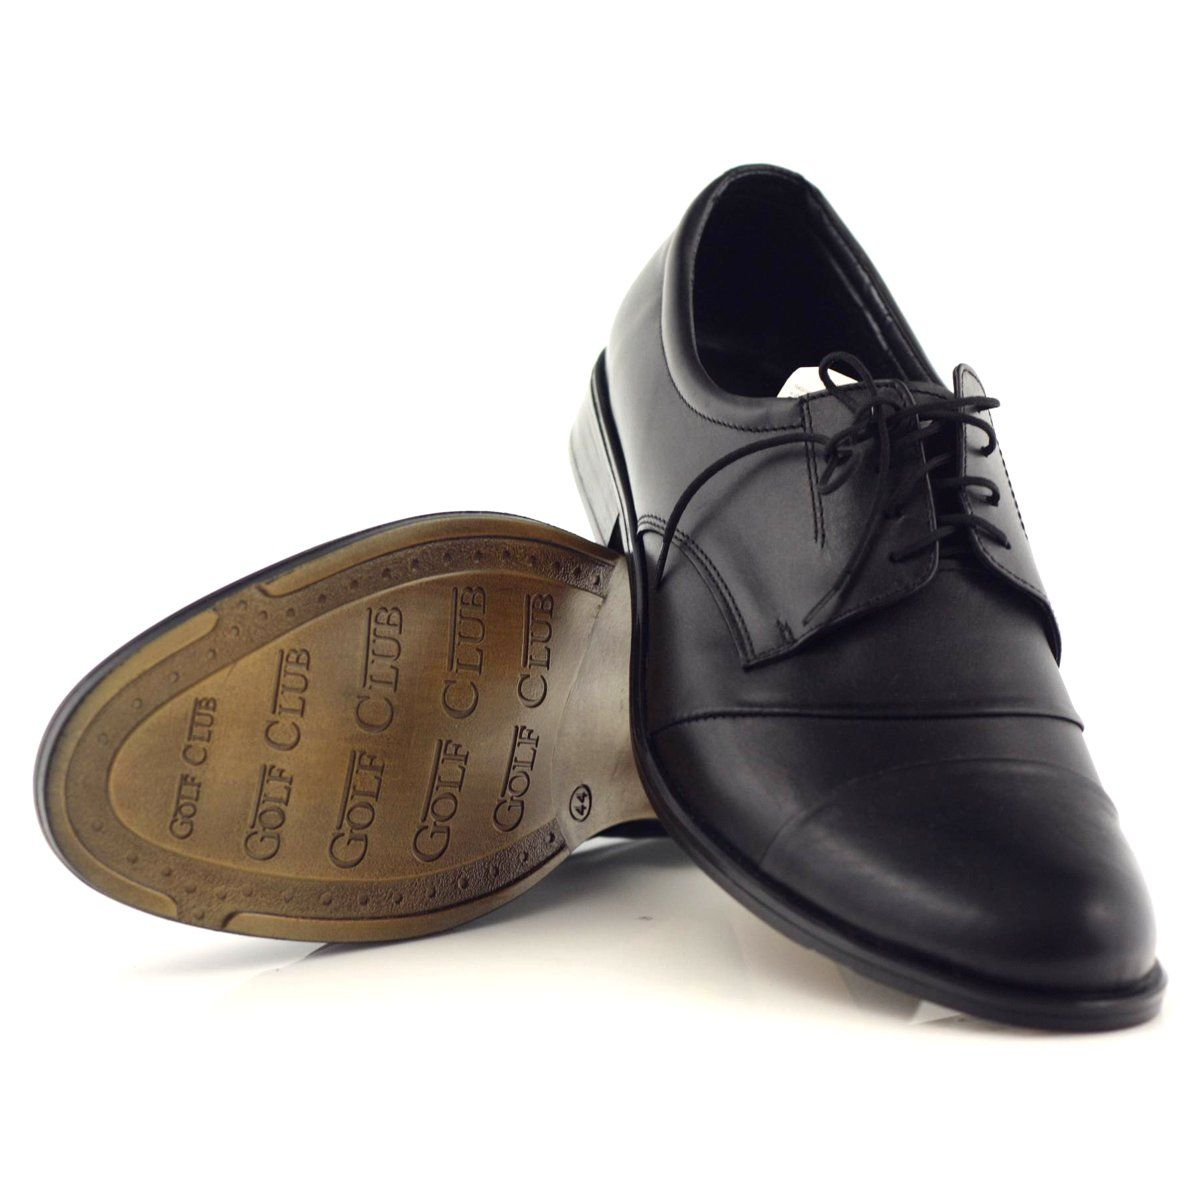 Polbuty Meskie Moskala 230 Czarne Dance Shoes Shoes Sport Shoes